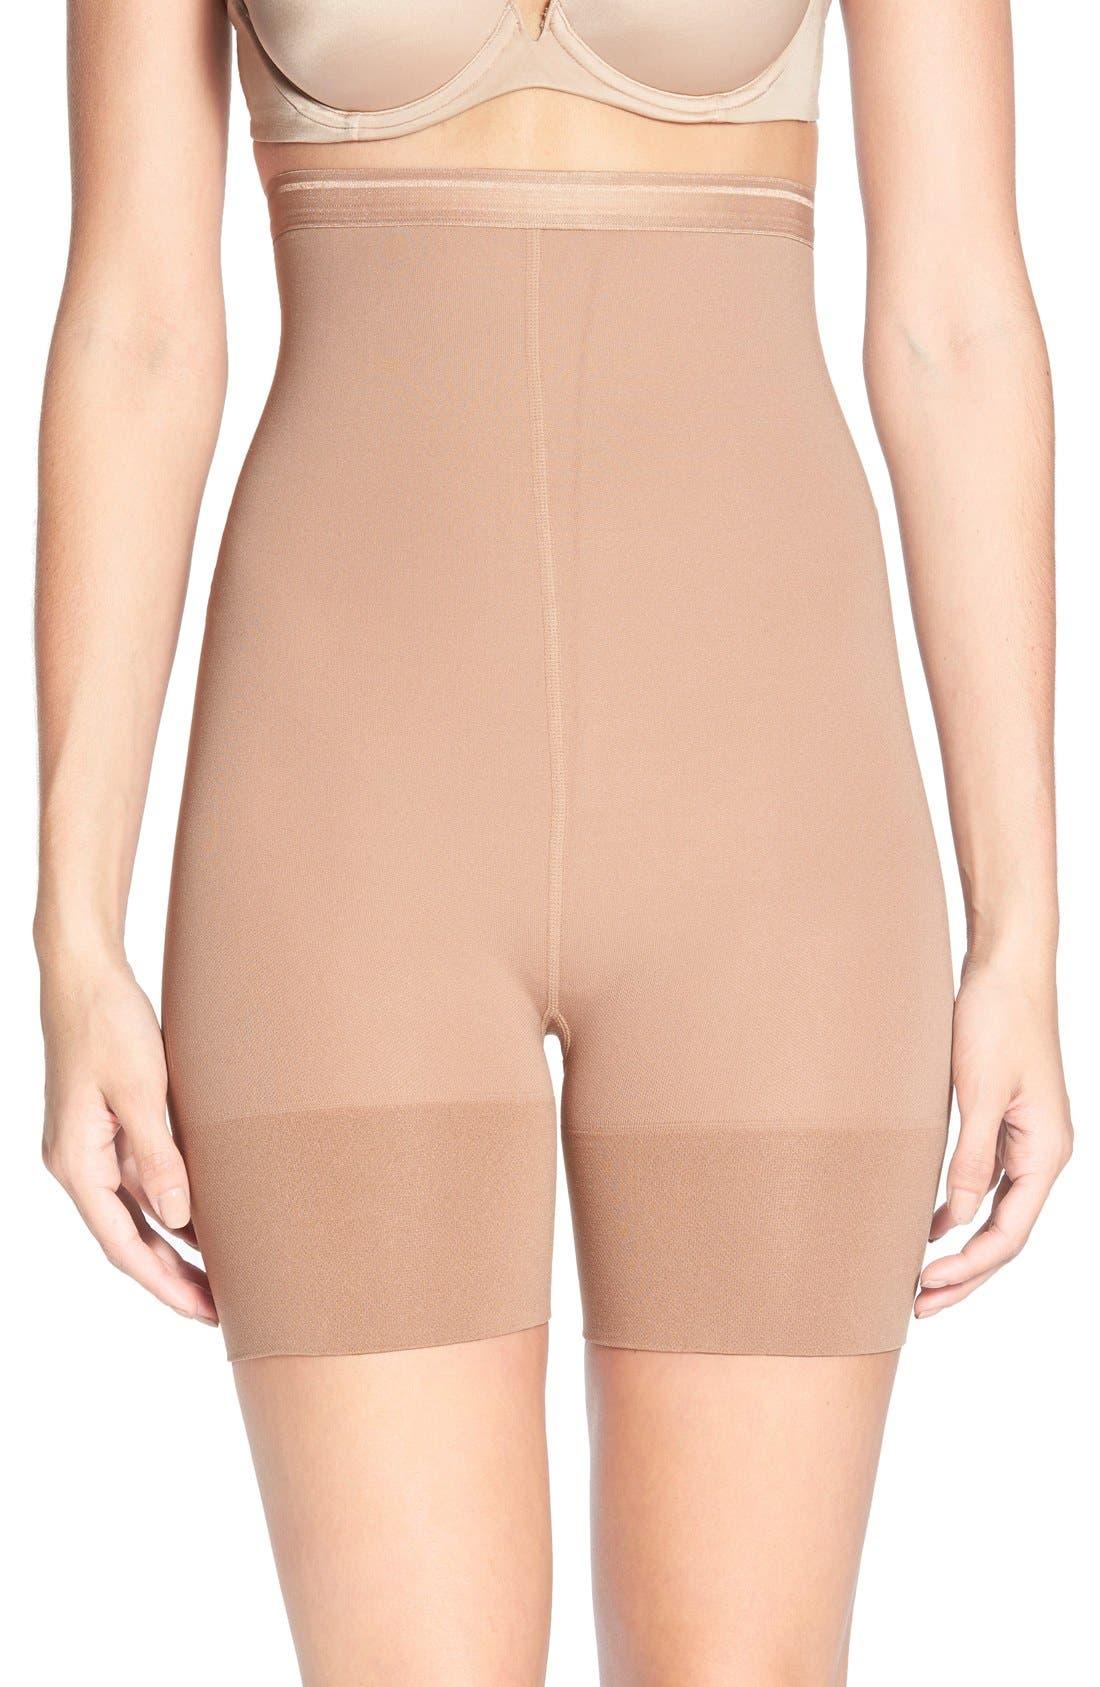 Alternate Image 1 Selected - ITEM m6 Shorty Shaping Shorts